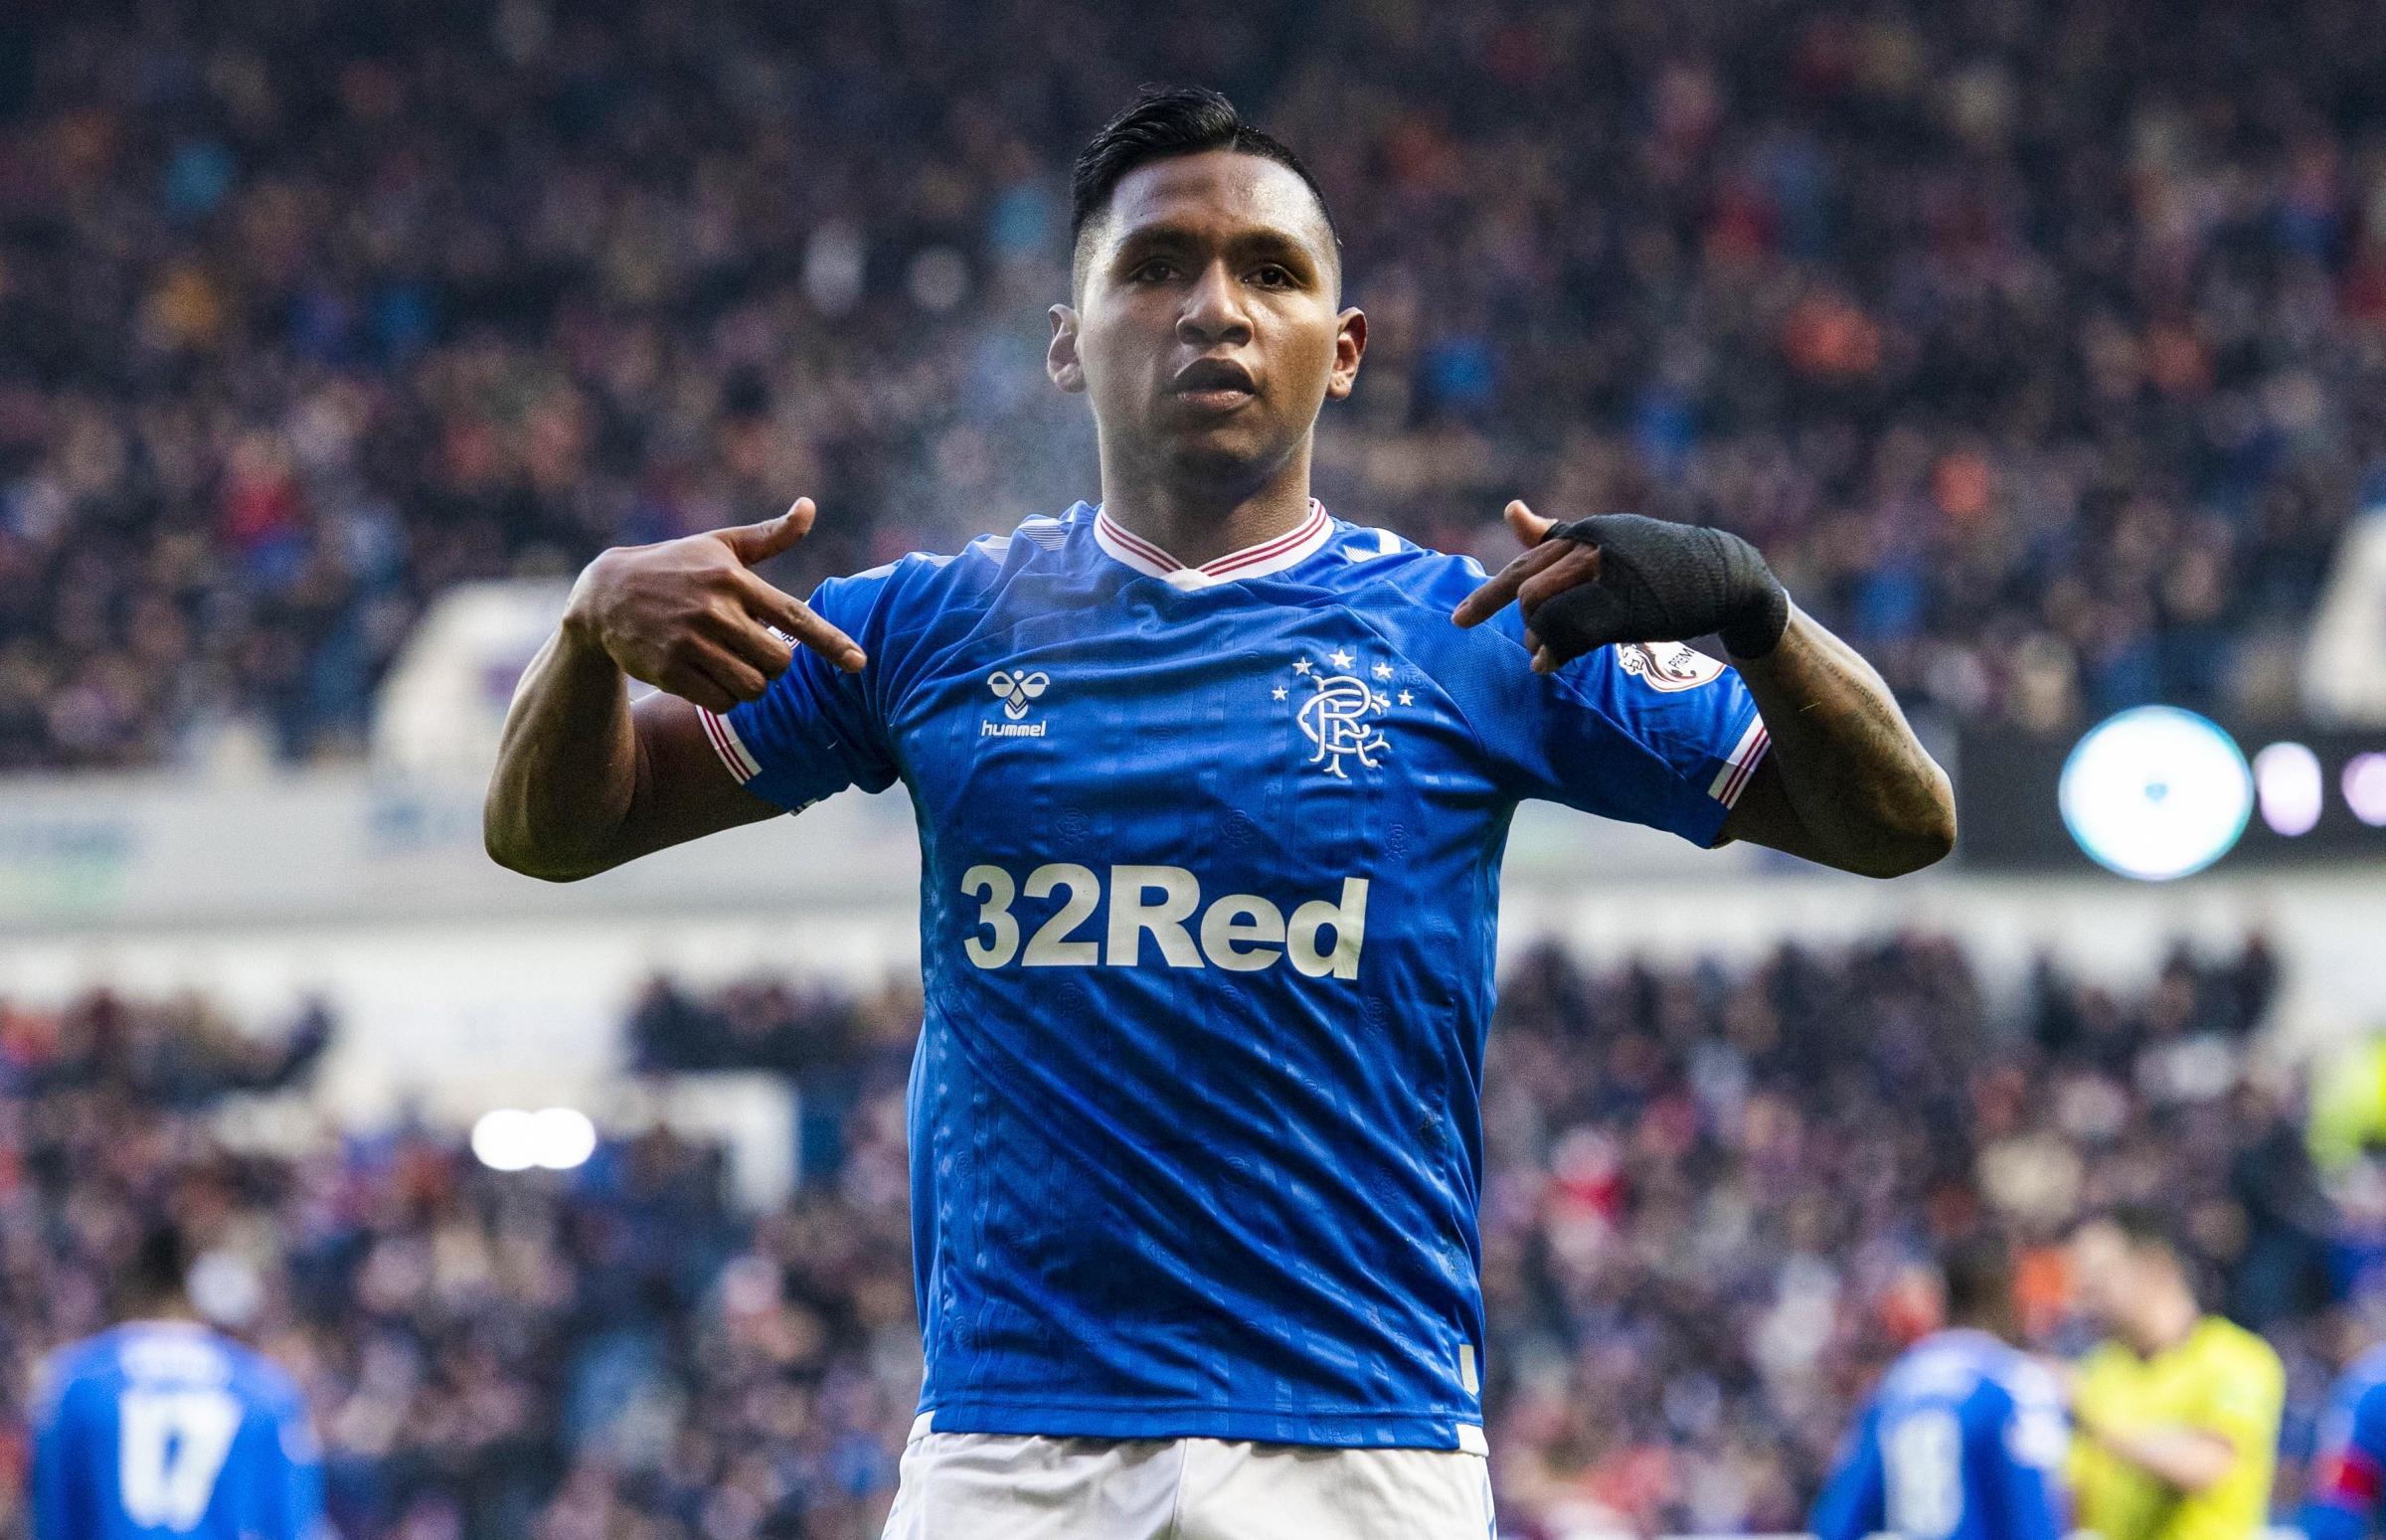 Derek Johnstone: Rangers shouldn't accept less than £30m for Alfredo Morelos